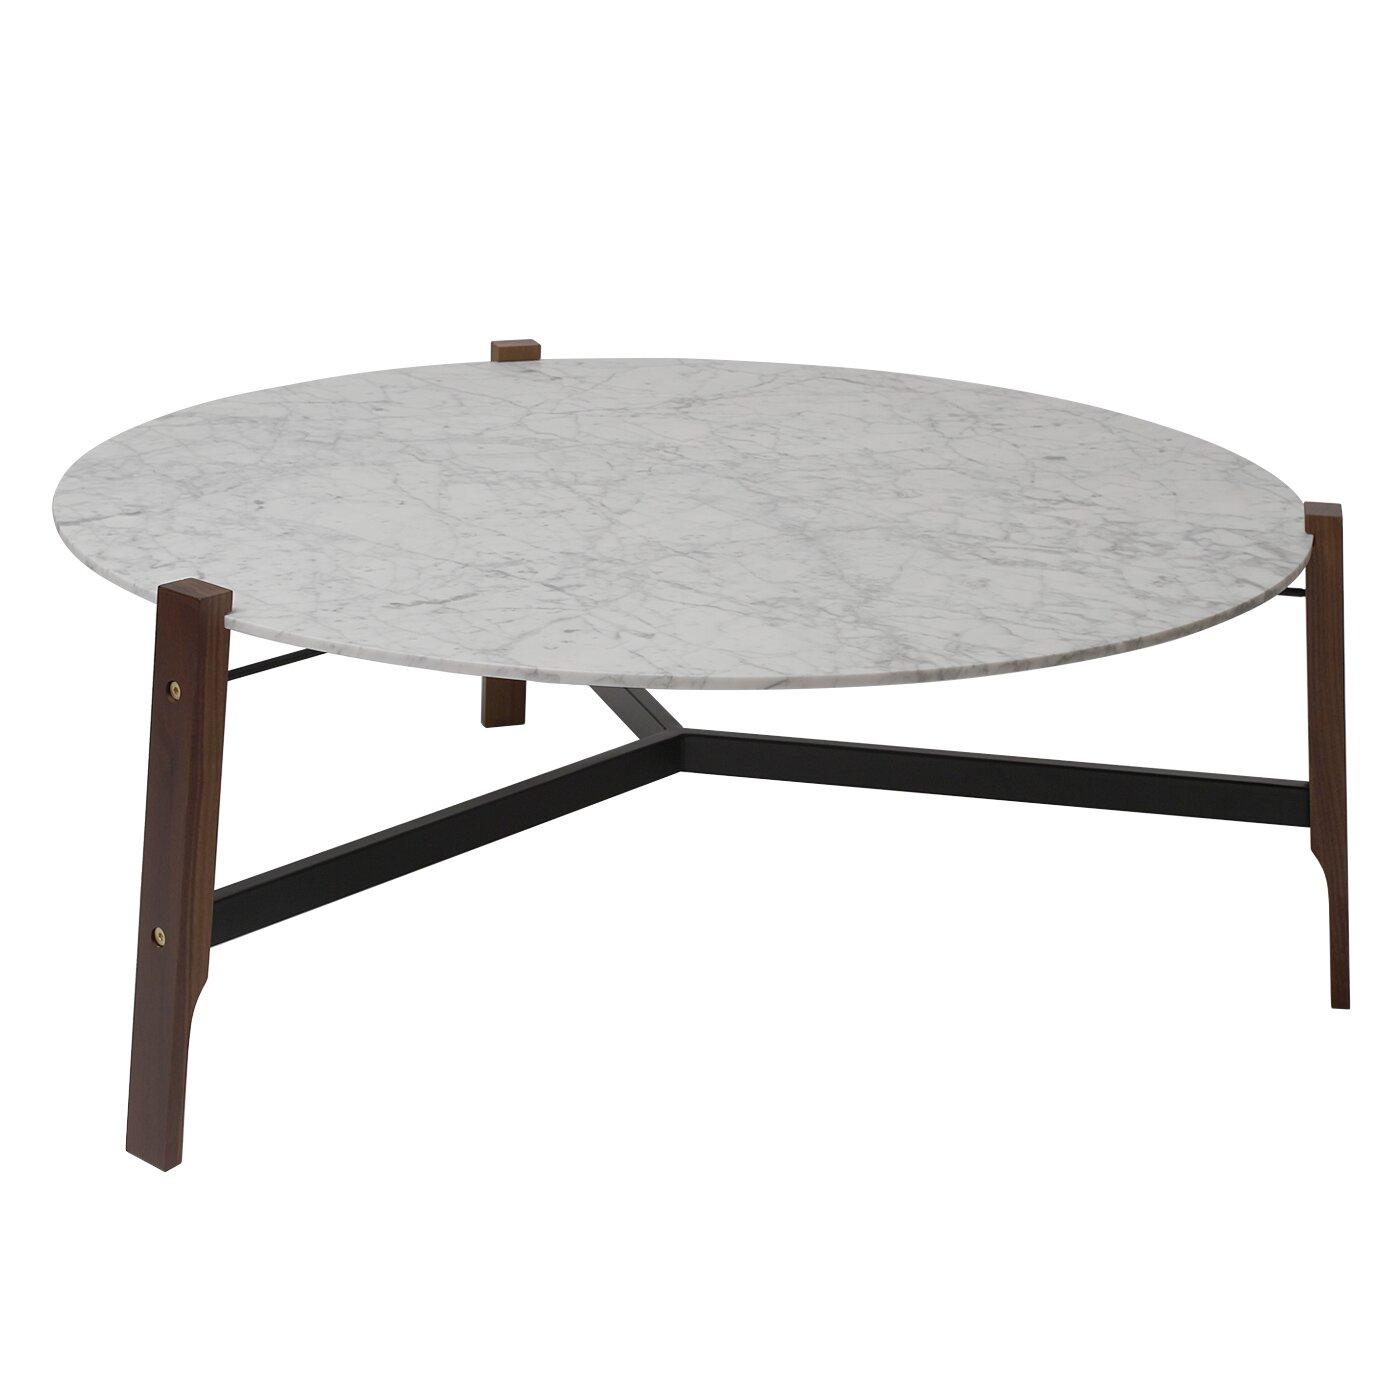 Free Range Coffee Table - Modern Marble Coffee Tables AllModern